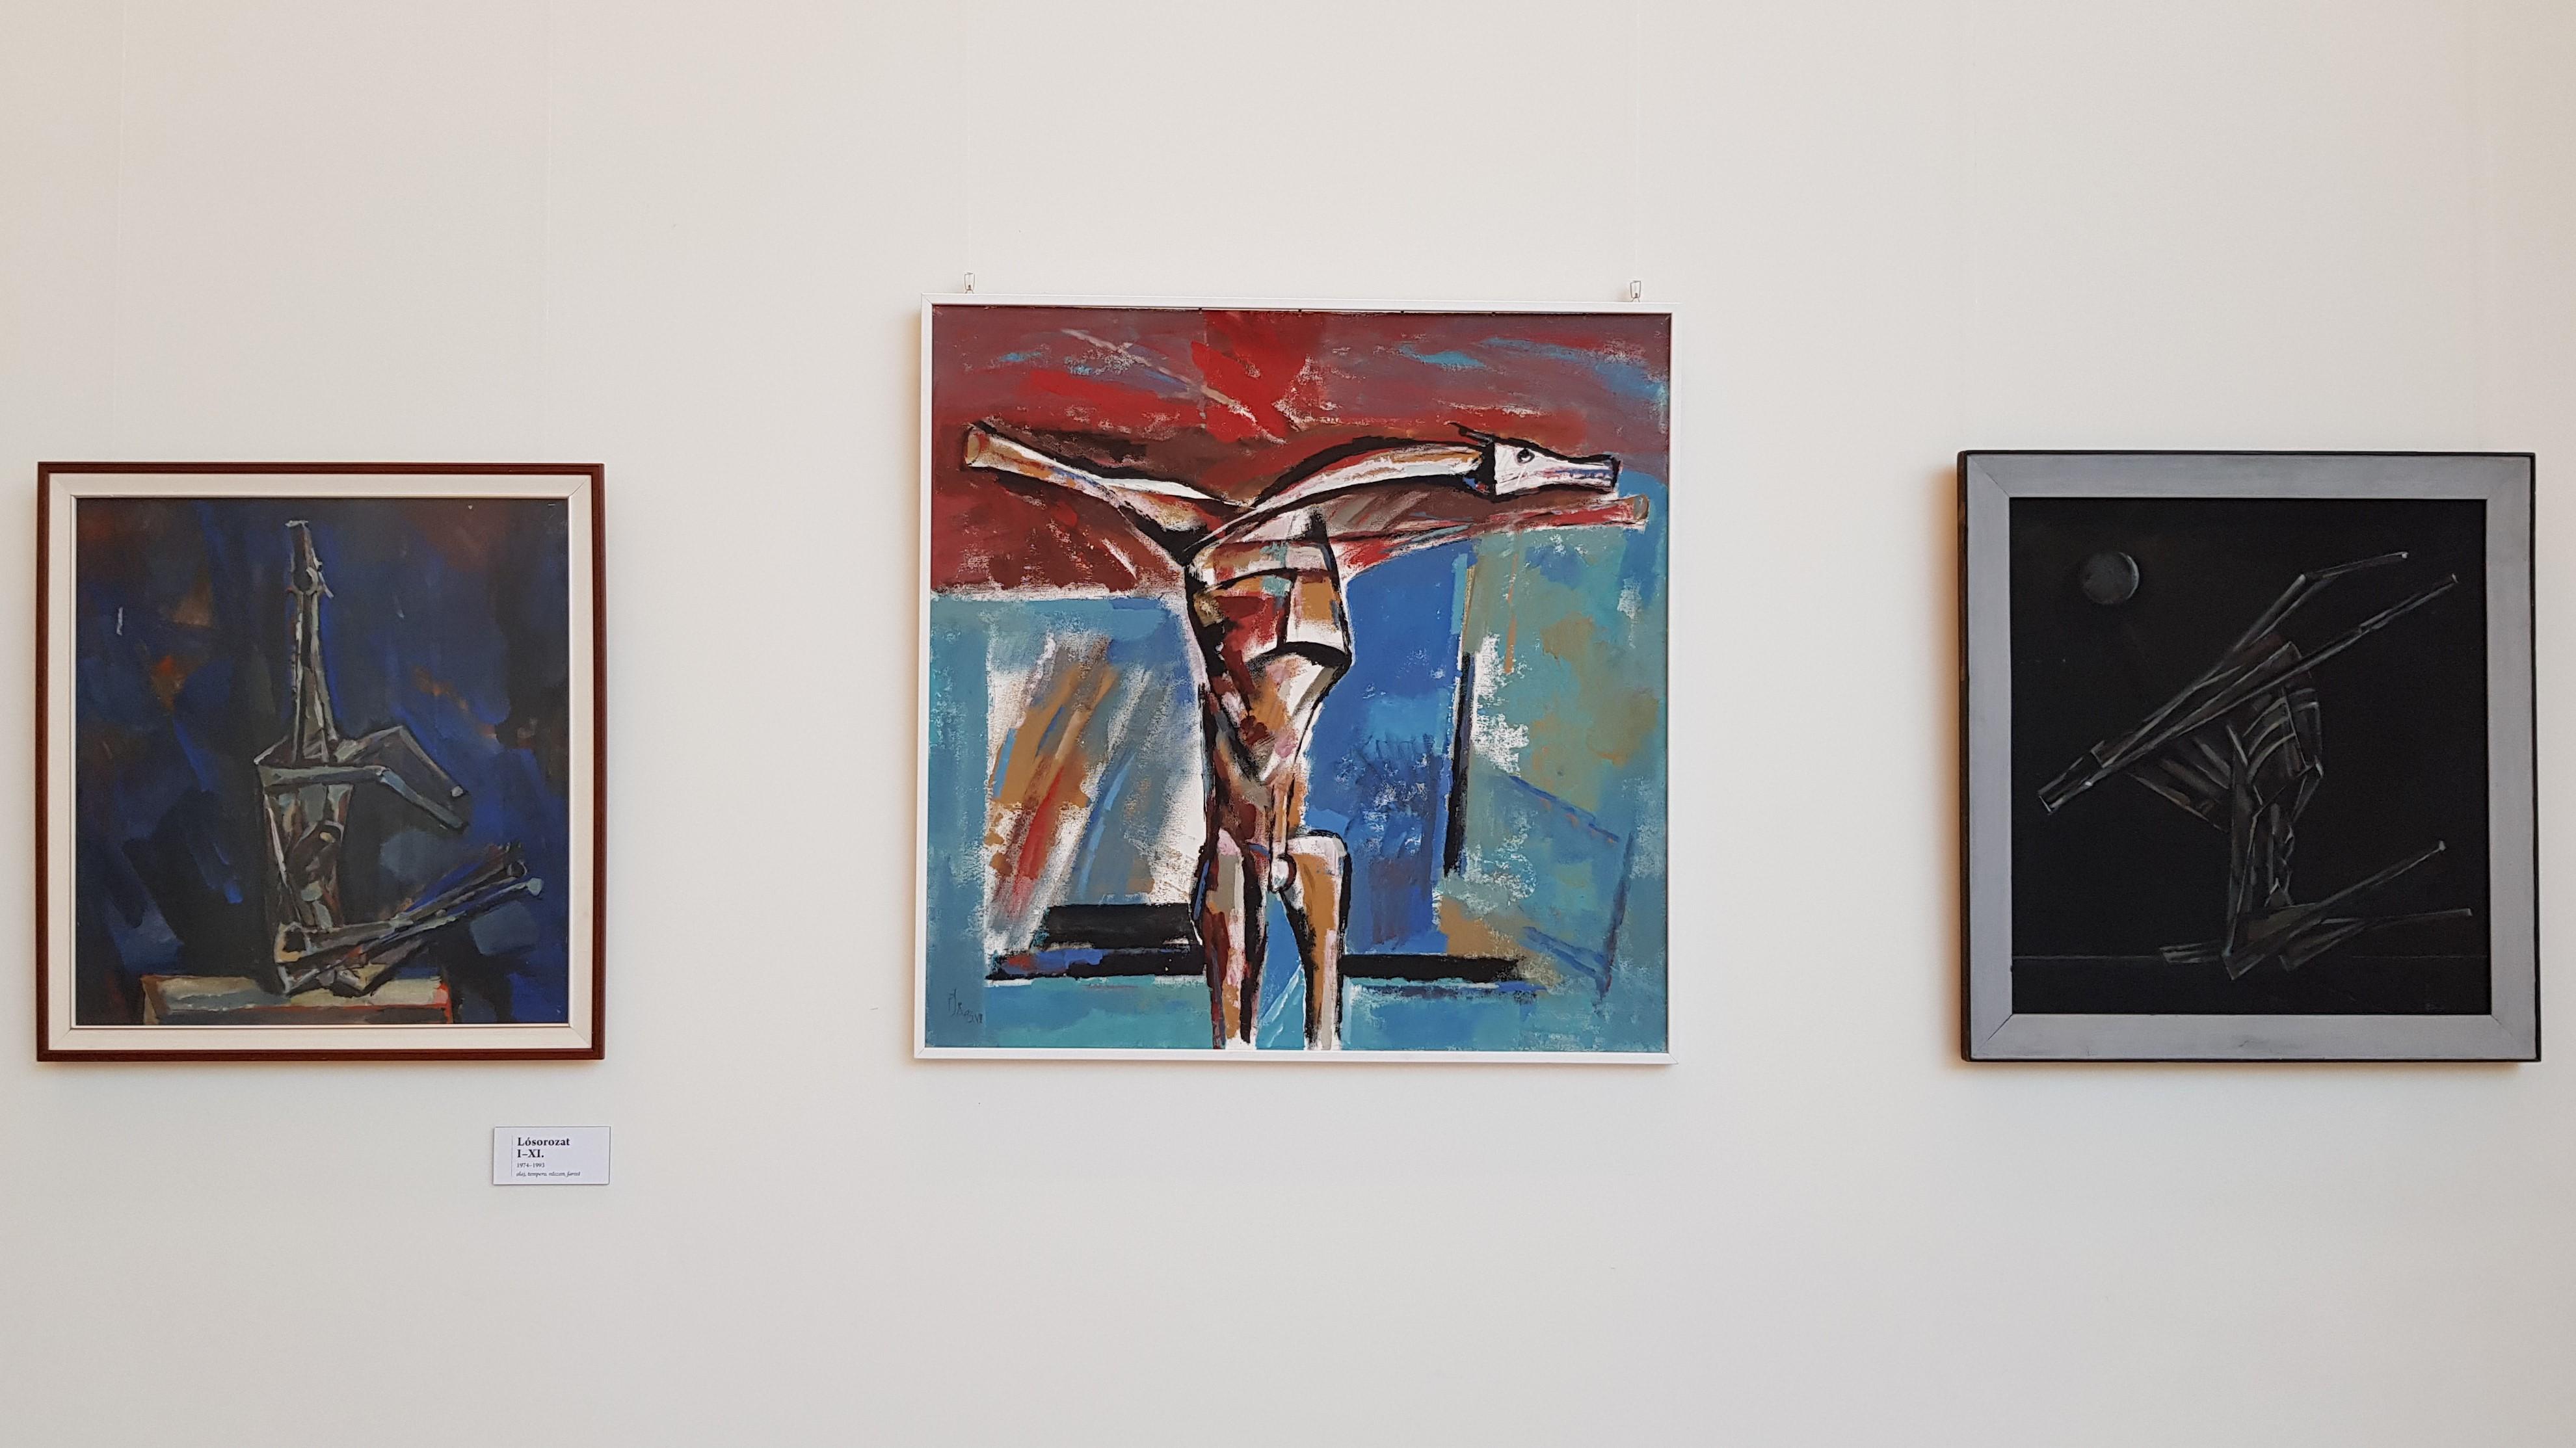 Plugor Sándor (1940-1999) emlékkiállítás